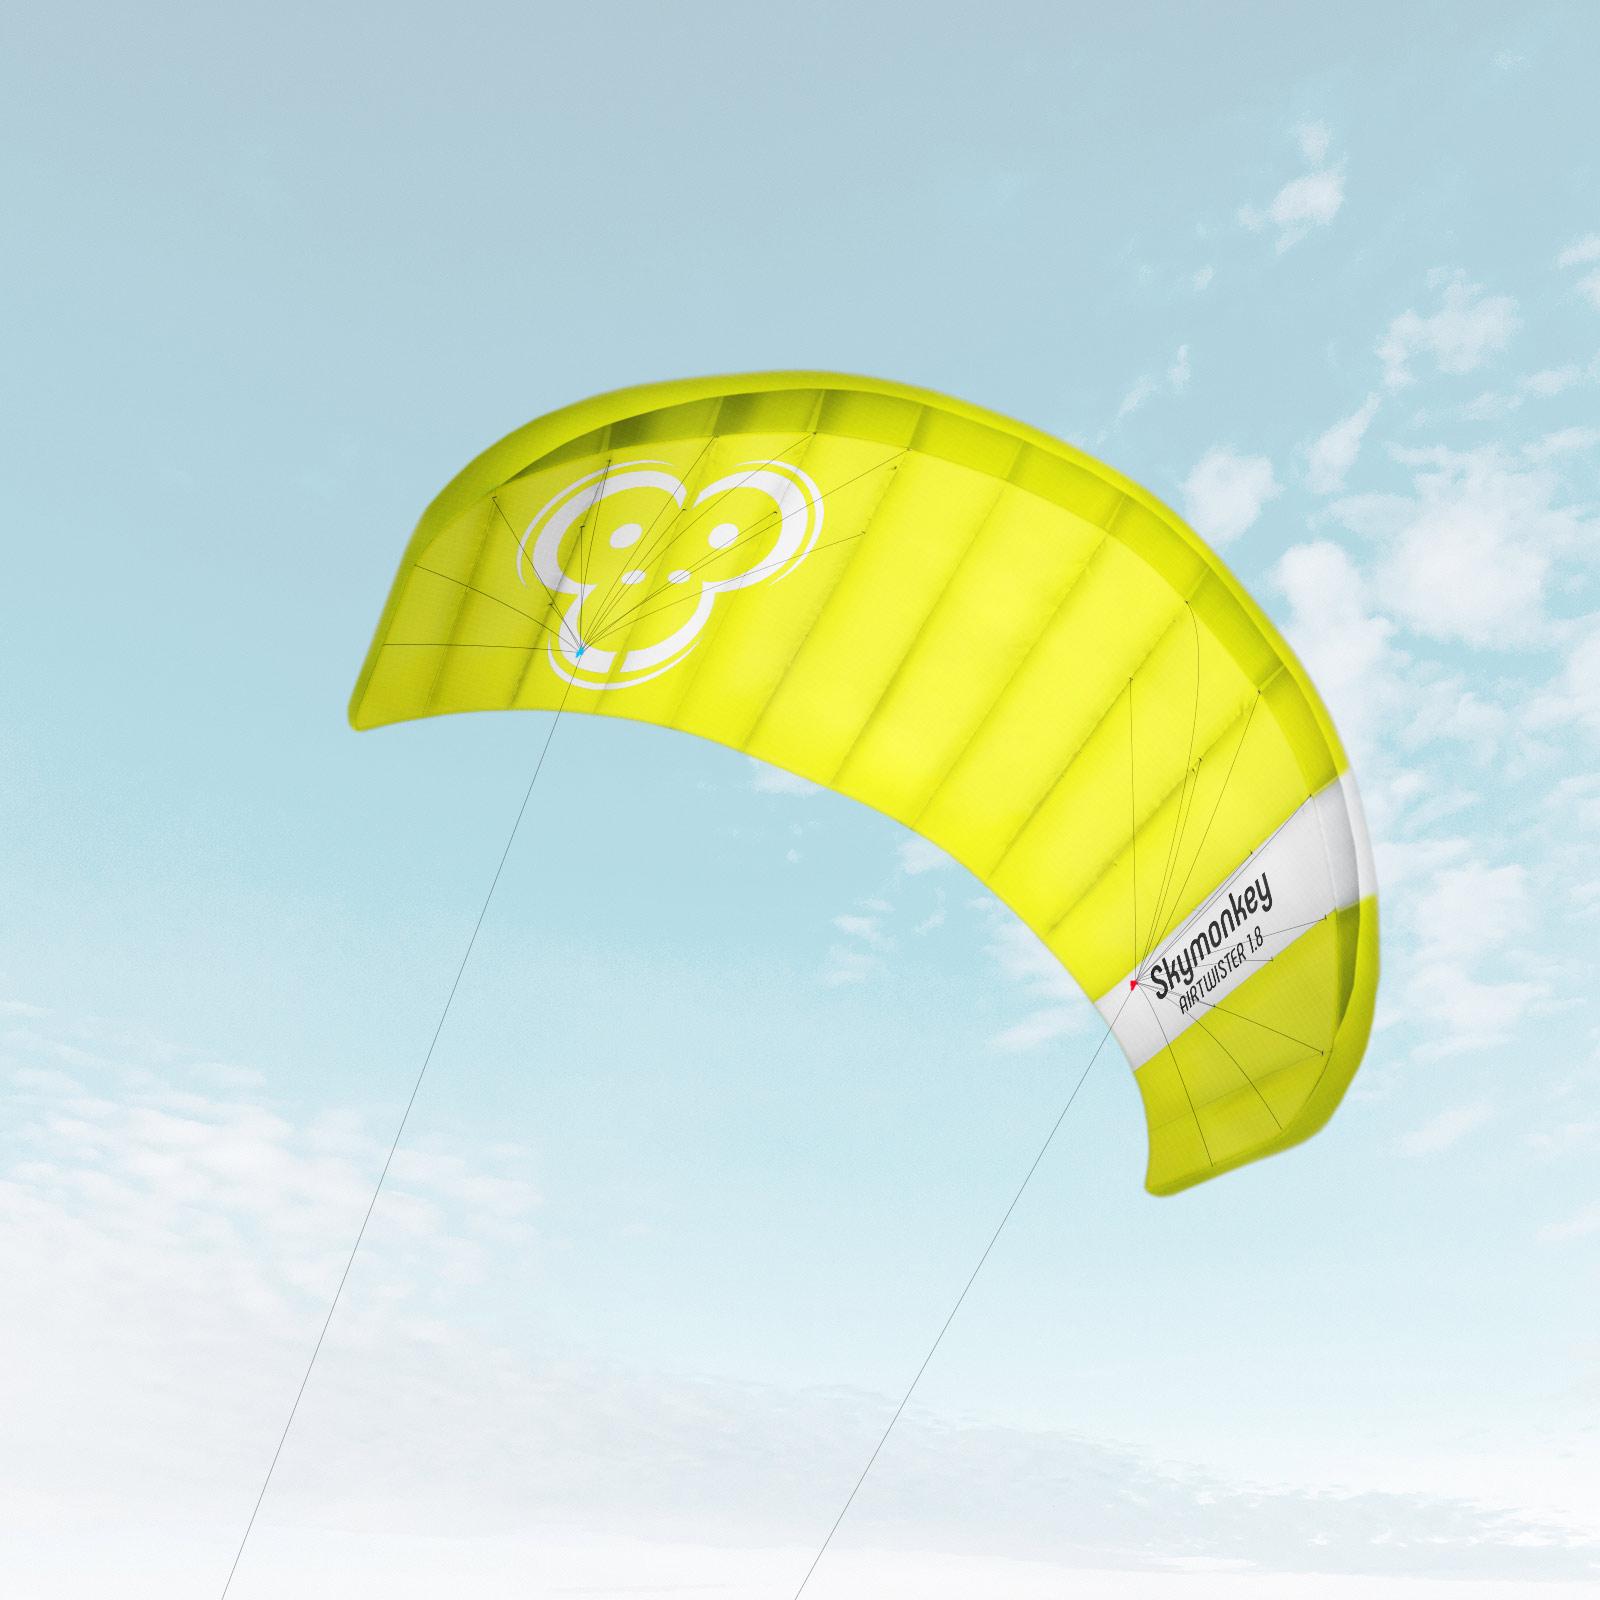 3D Rot Flying Dragon Kite Outdoor Kinderspielzeug 328ft Schwanz Linie große Y5T4